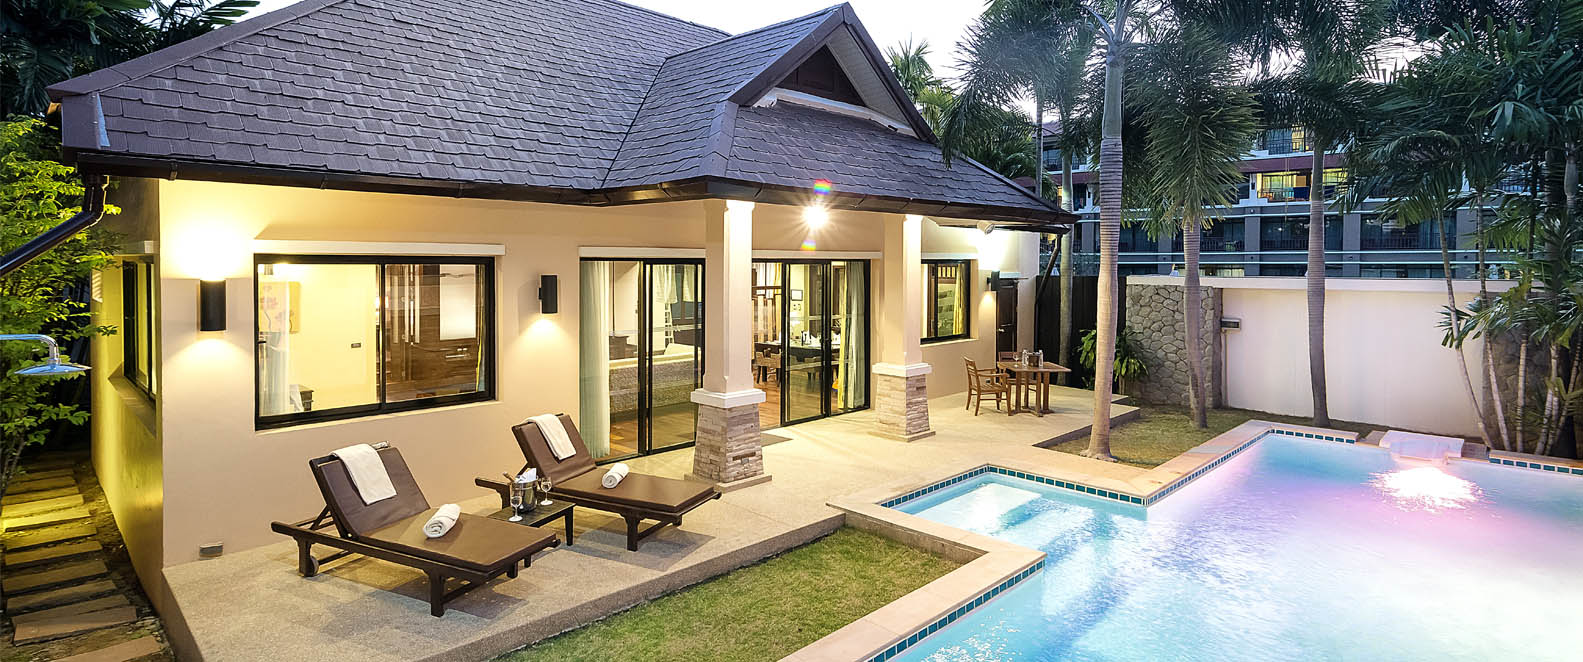 Phuket Kata Pool Access Resorts Accommodation At Alpina Phuket - Alpina phuket nalina resort and spa